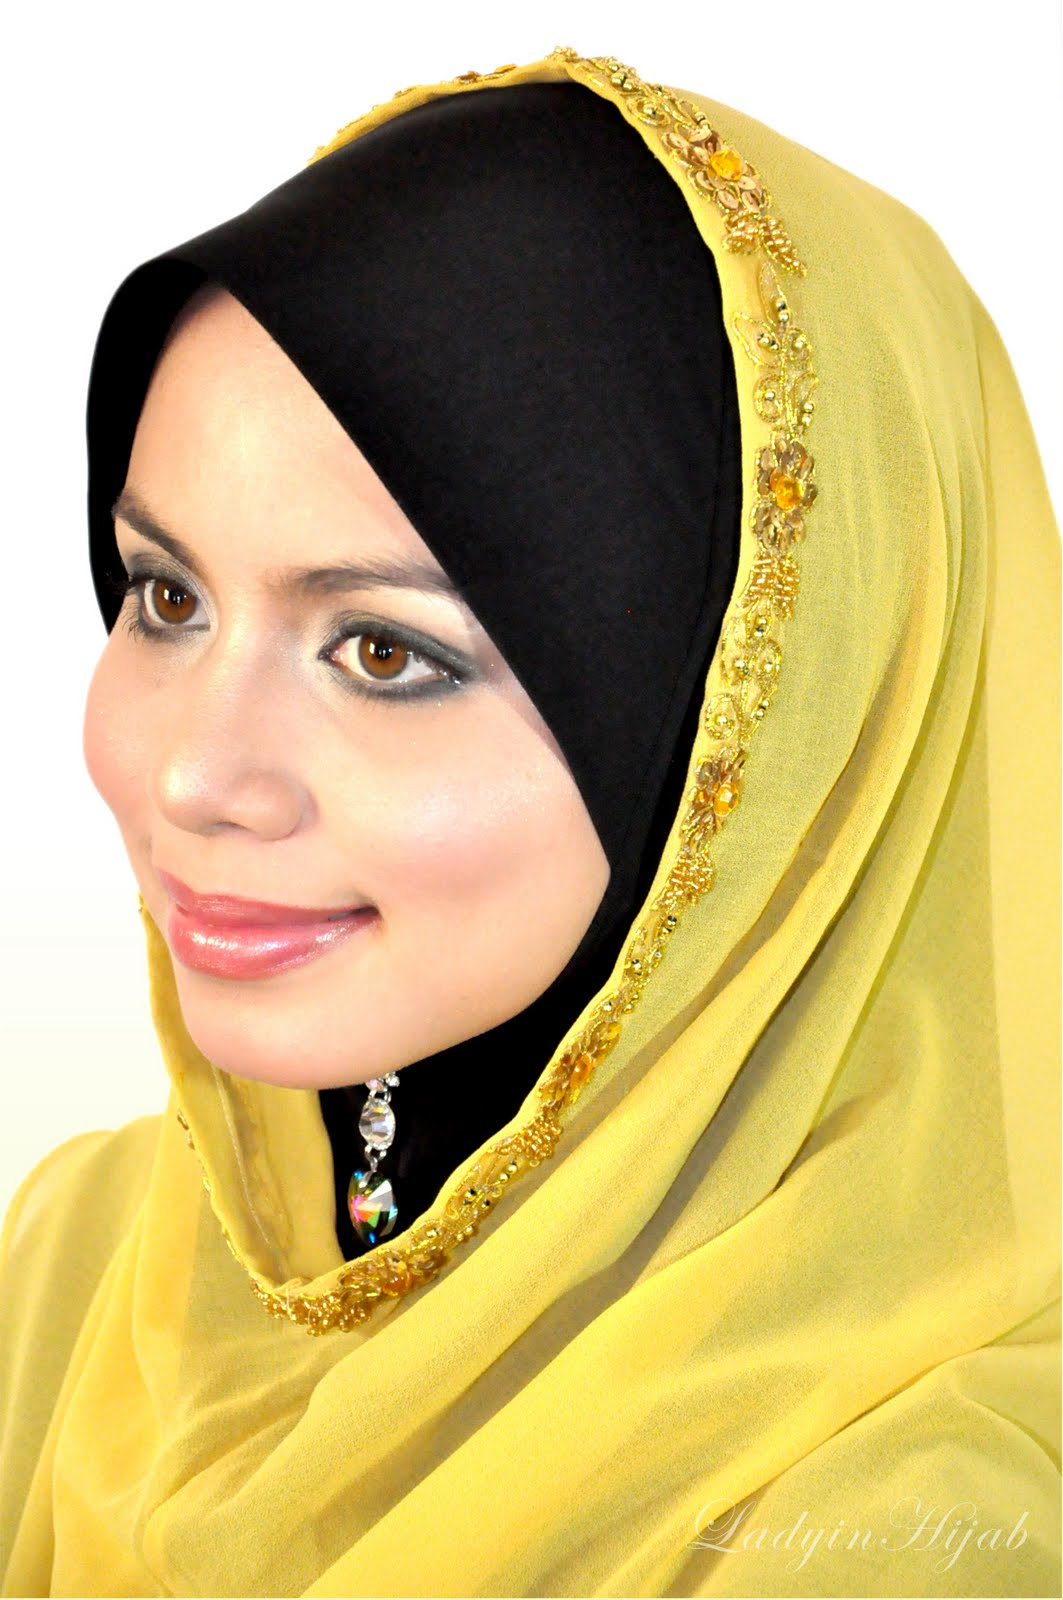 Lady in hijab photos